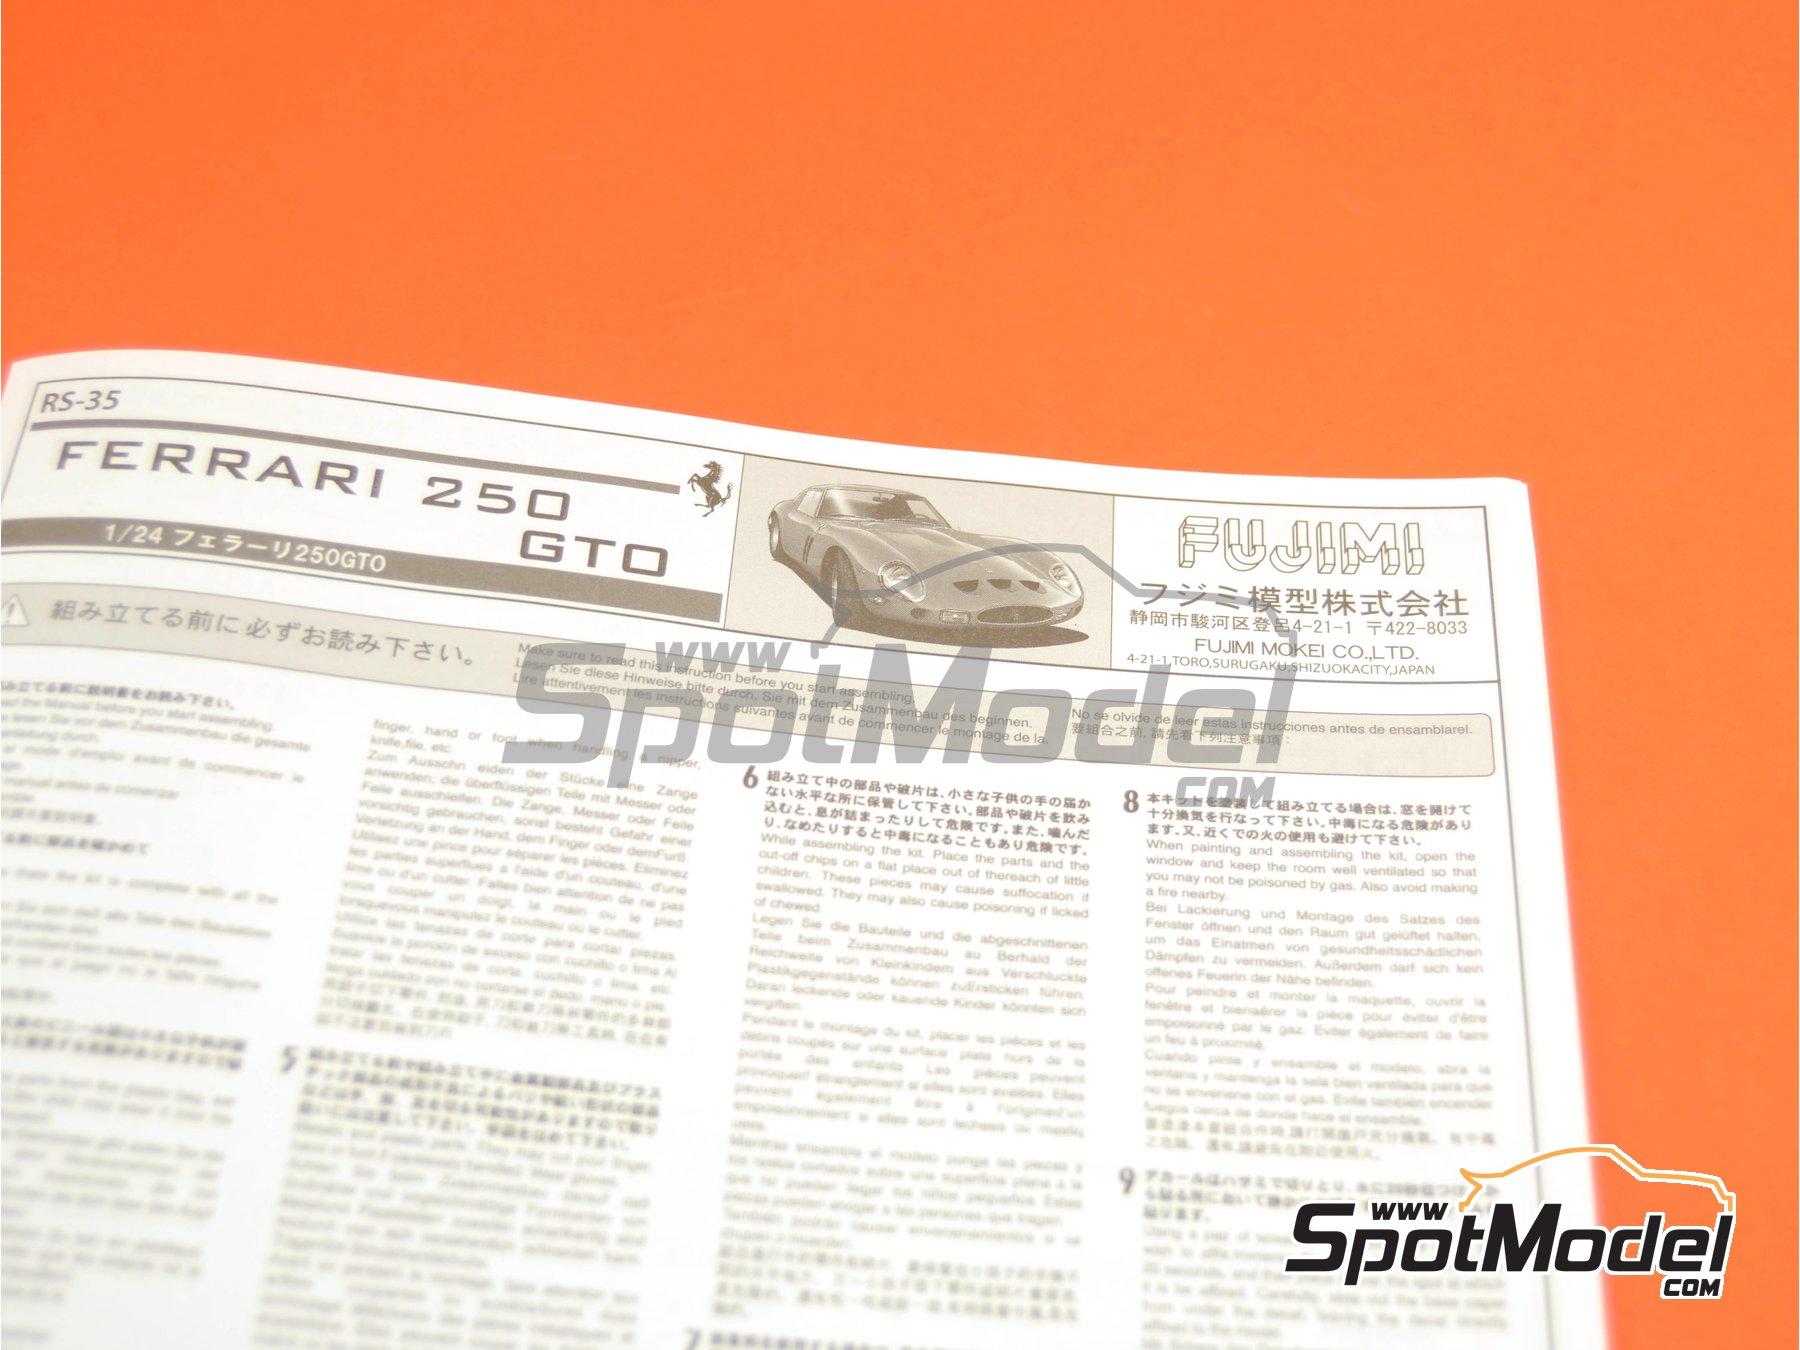 Image 13: Ferrari 250 GTO | Model kit in 1/24 scale manufactured by Fujimi (ref.FJ123370, also 123370 and RS-35)